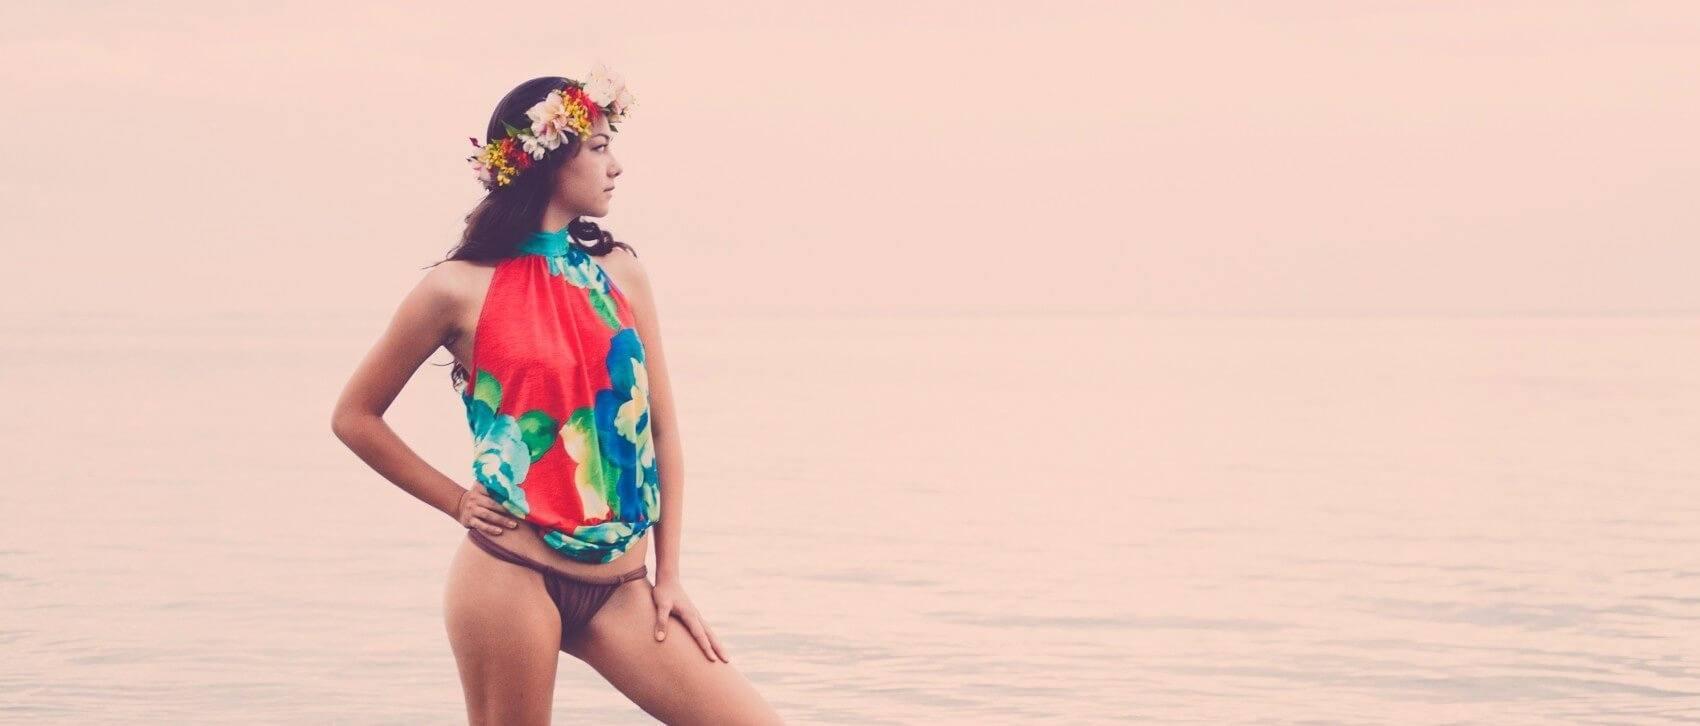 marc-gerard-photographe-mariage-montpellier-mode-tahiti-7